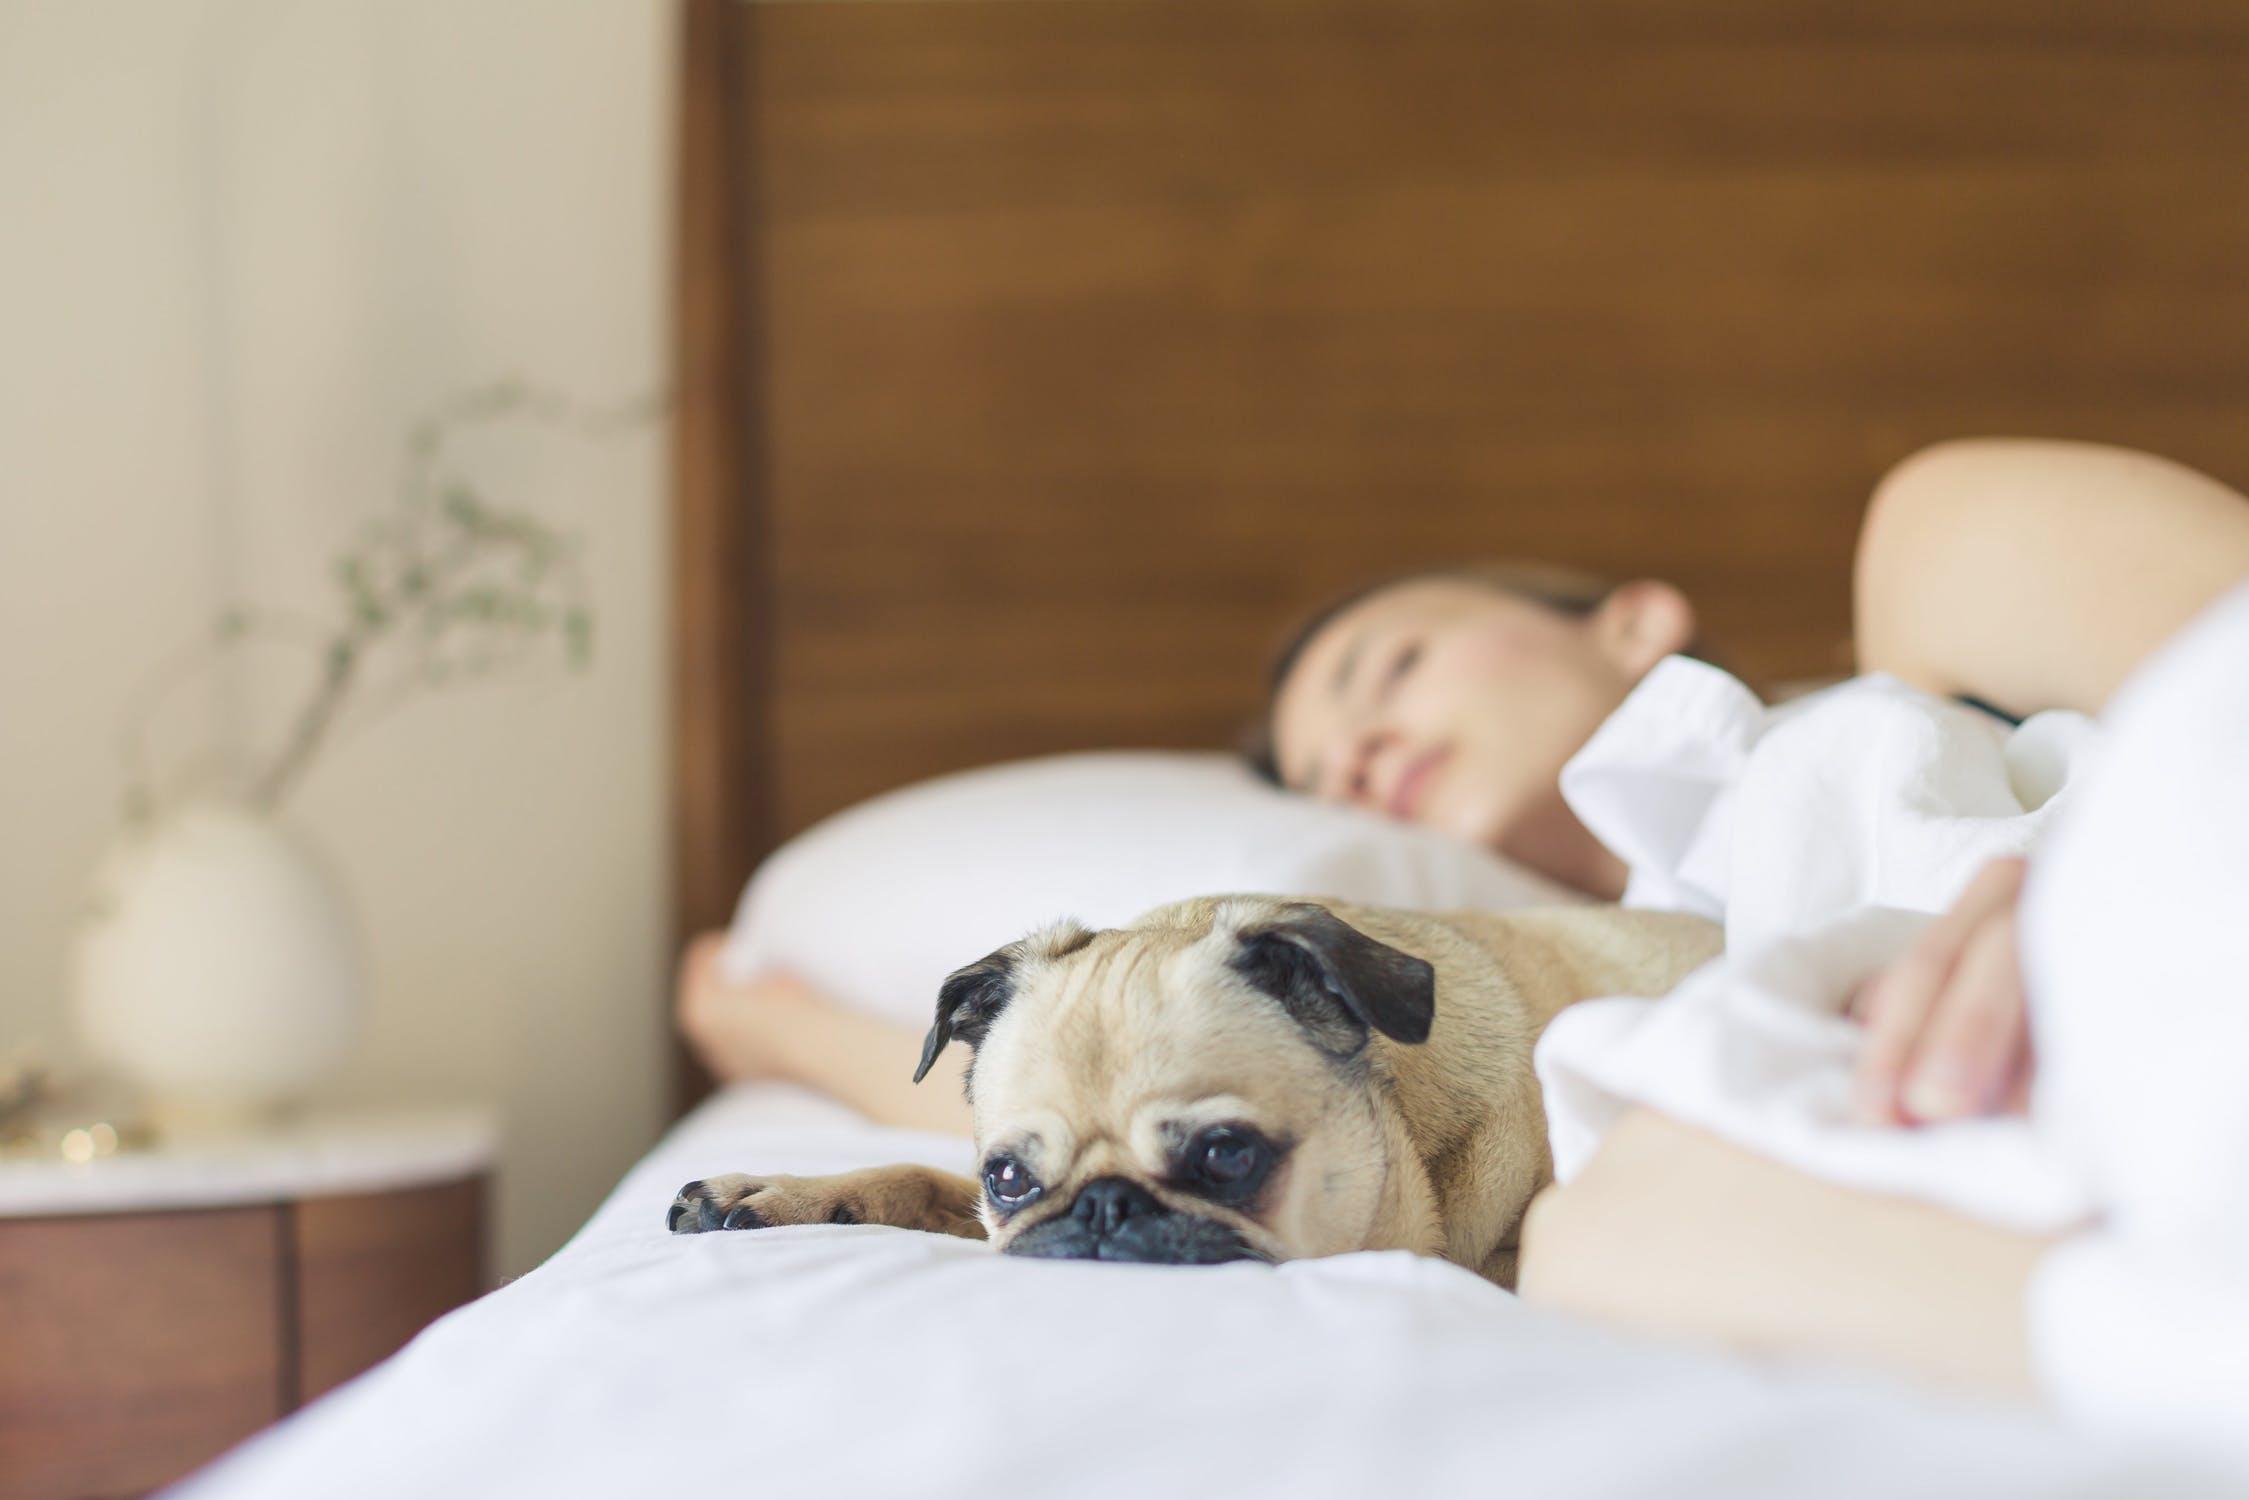 How to Get a Better Sleep